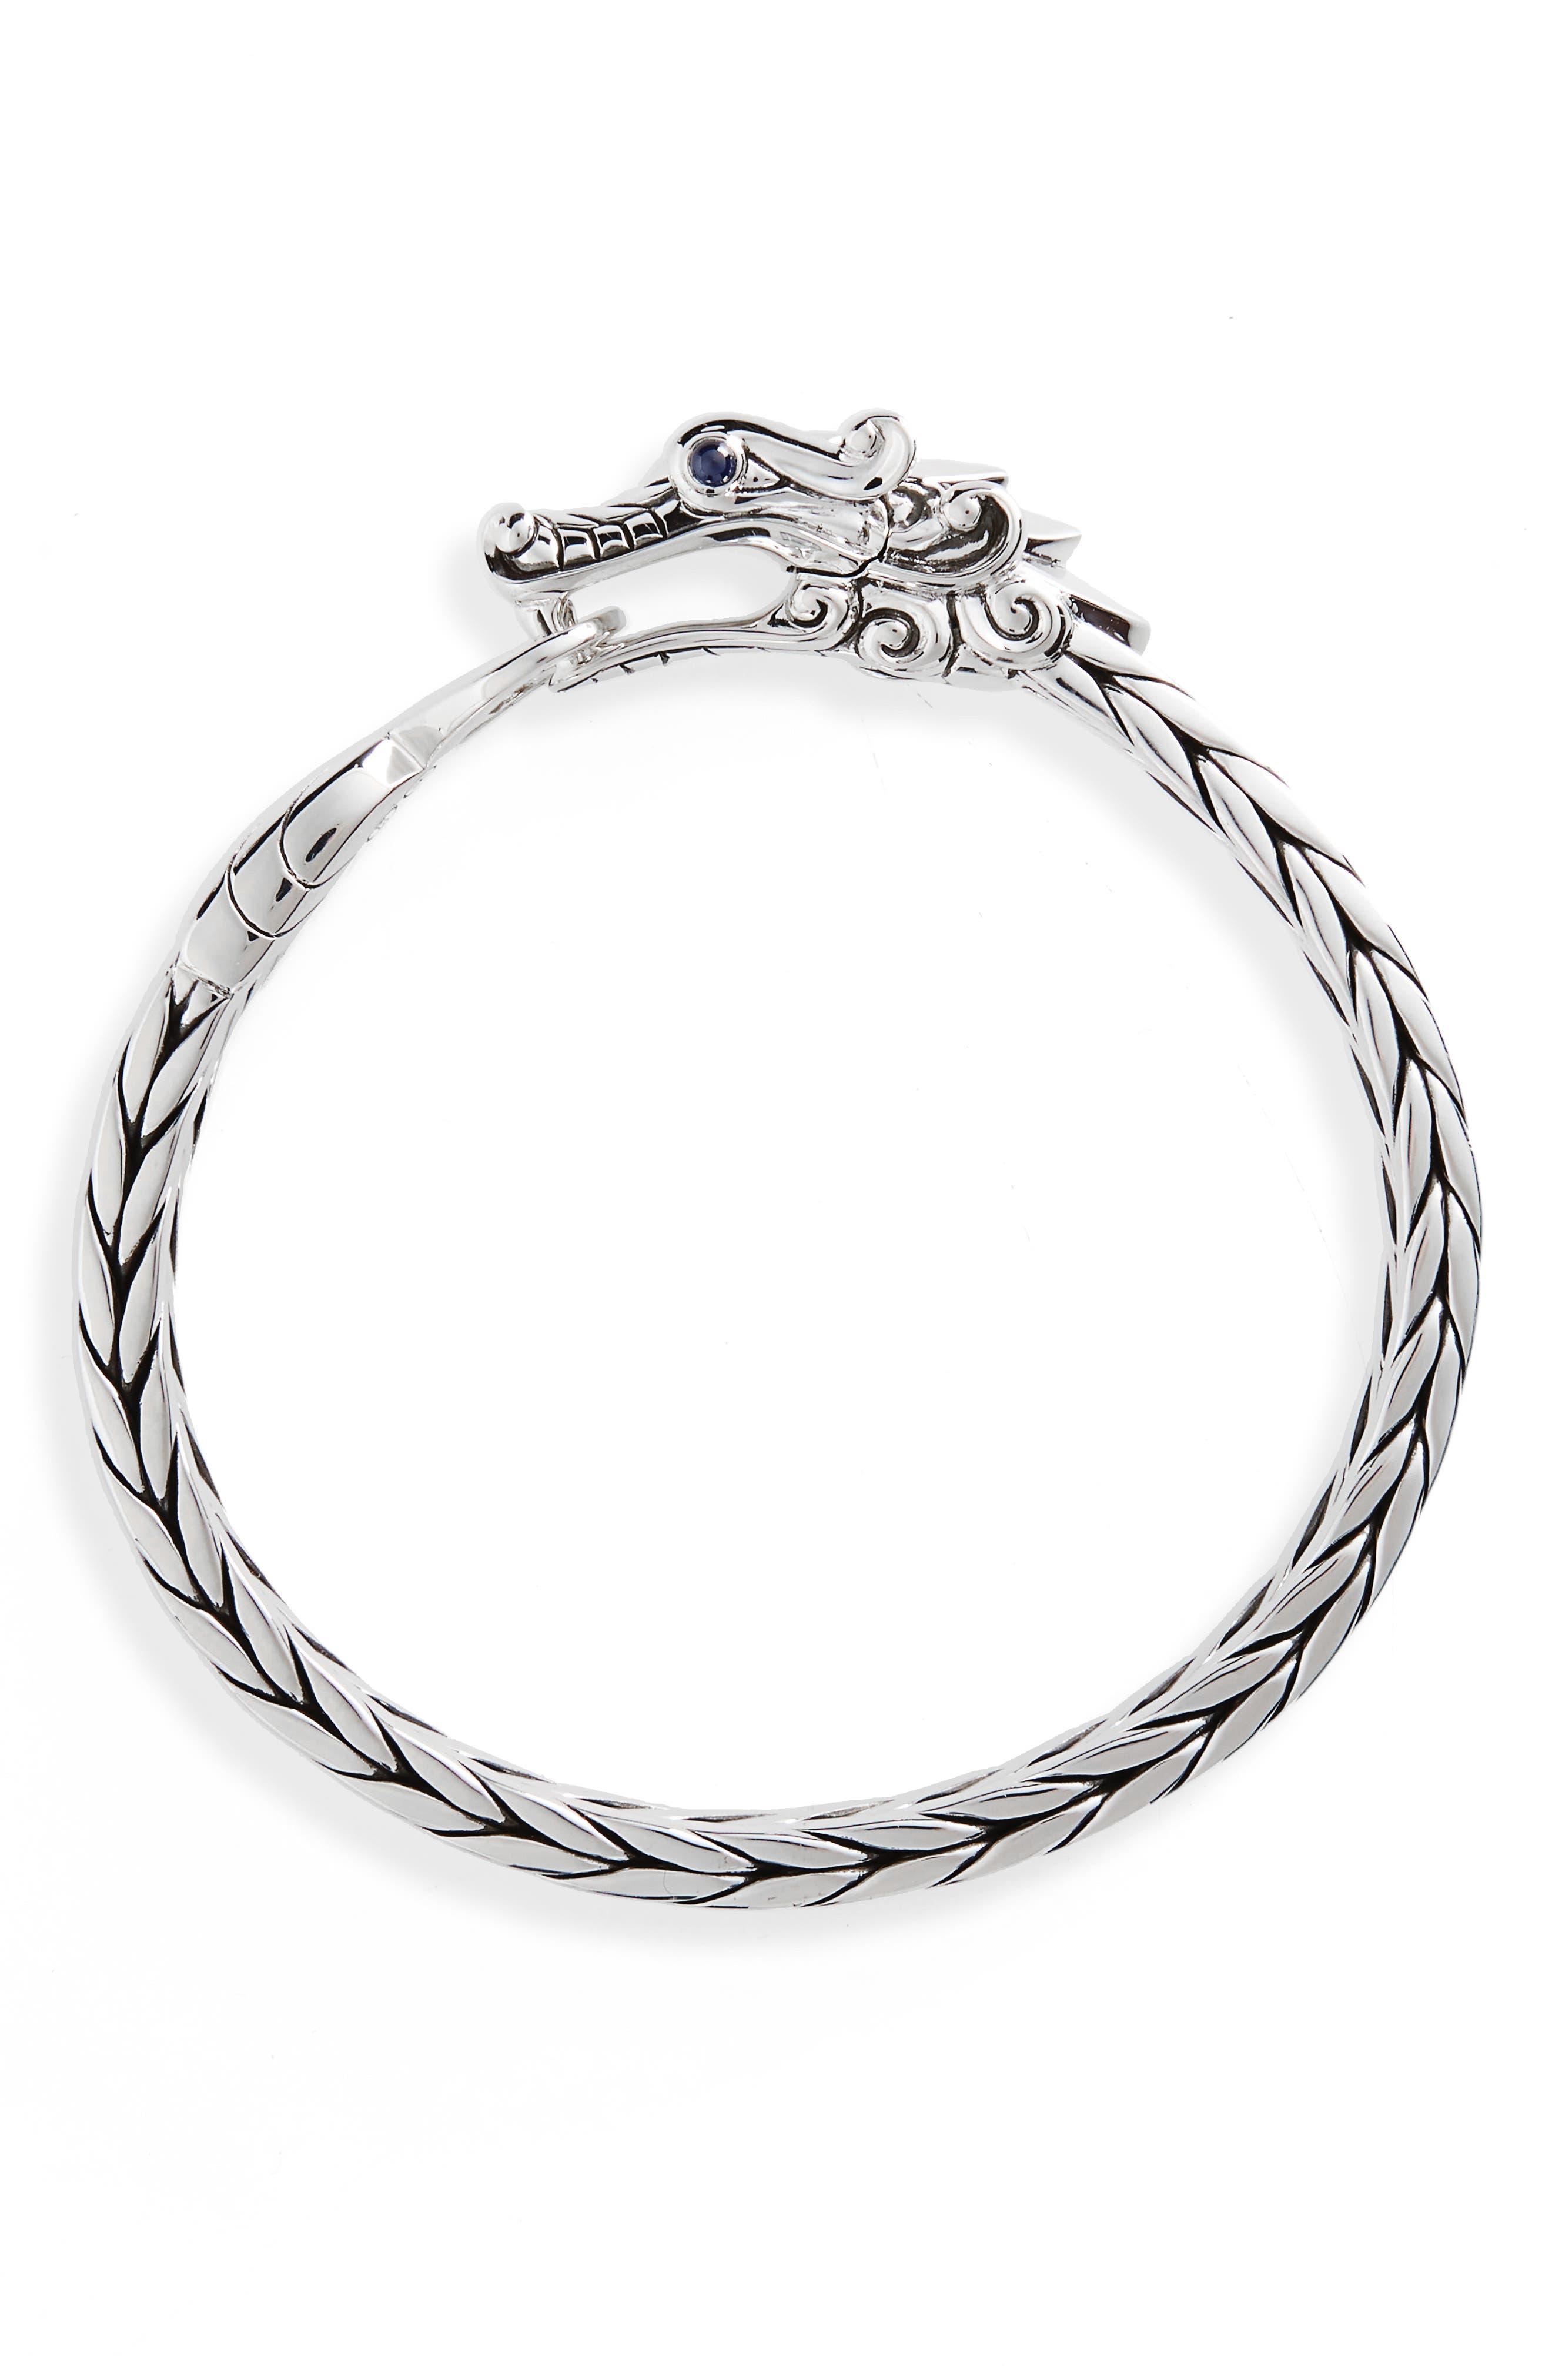 Legends Naga Sterling Silver Bracelet,                             Main thumbnail 1, color,                             Silver/ Blue Sapphire